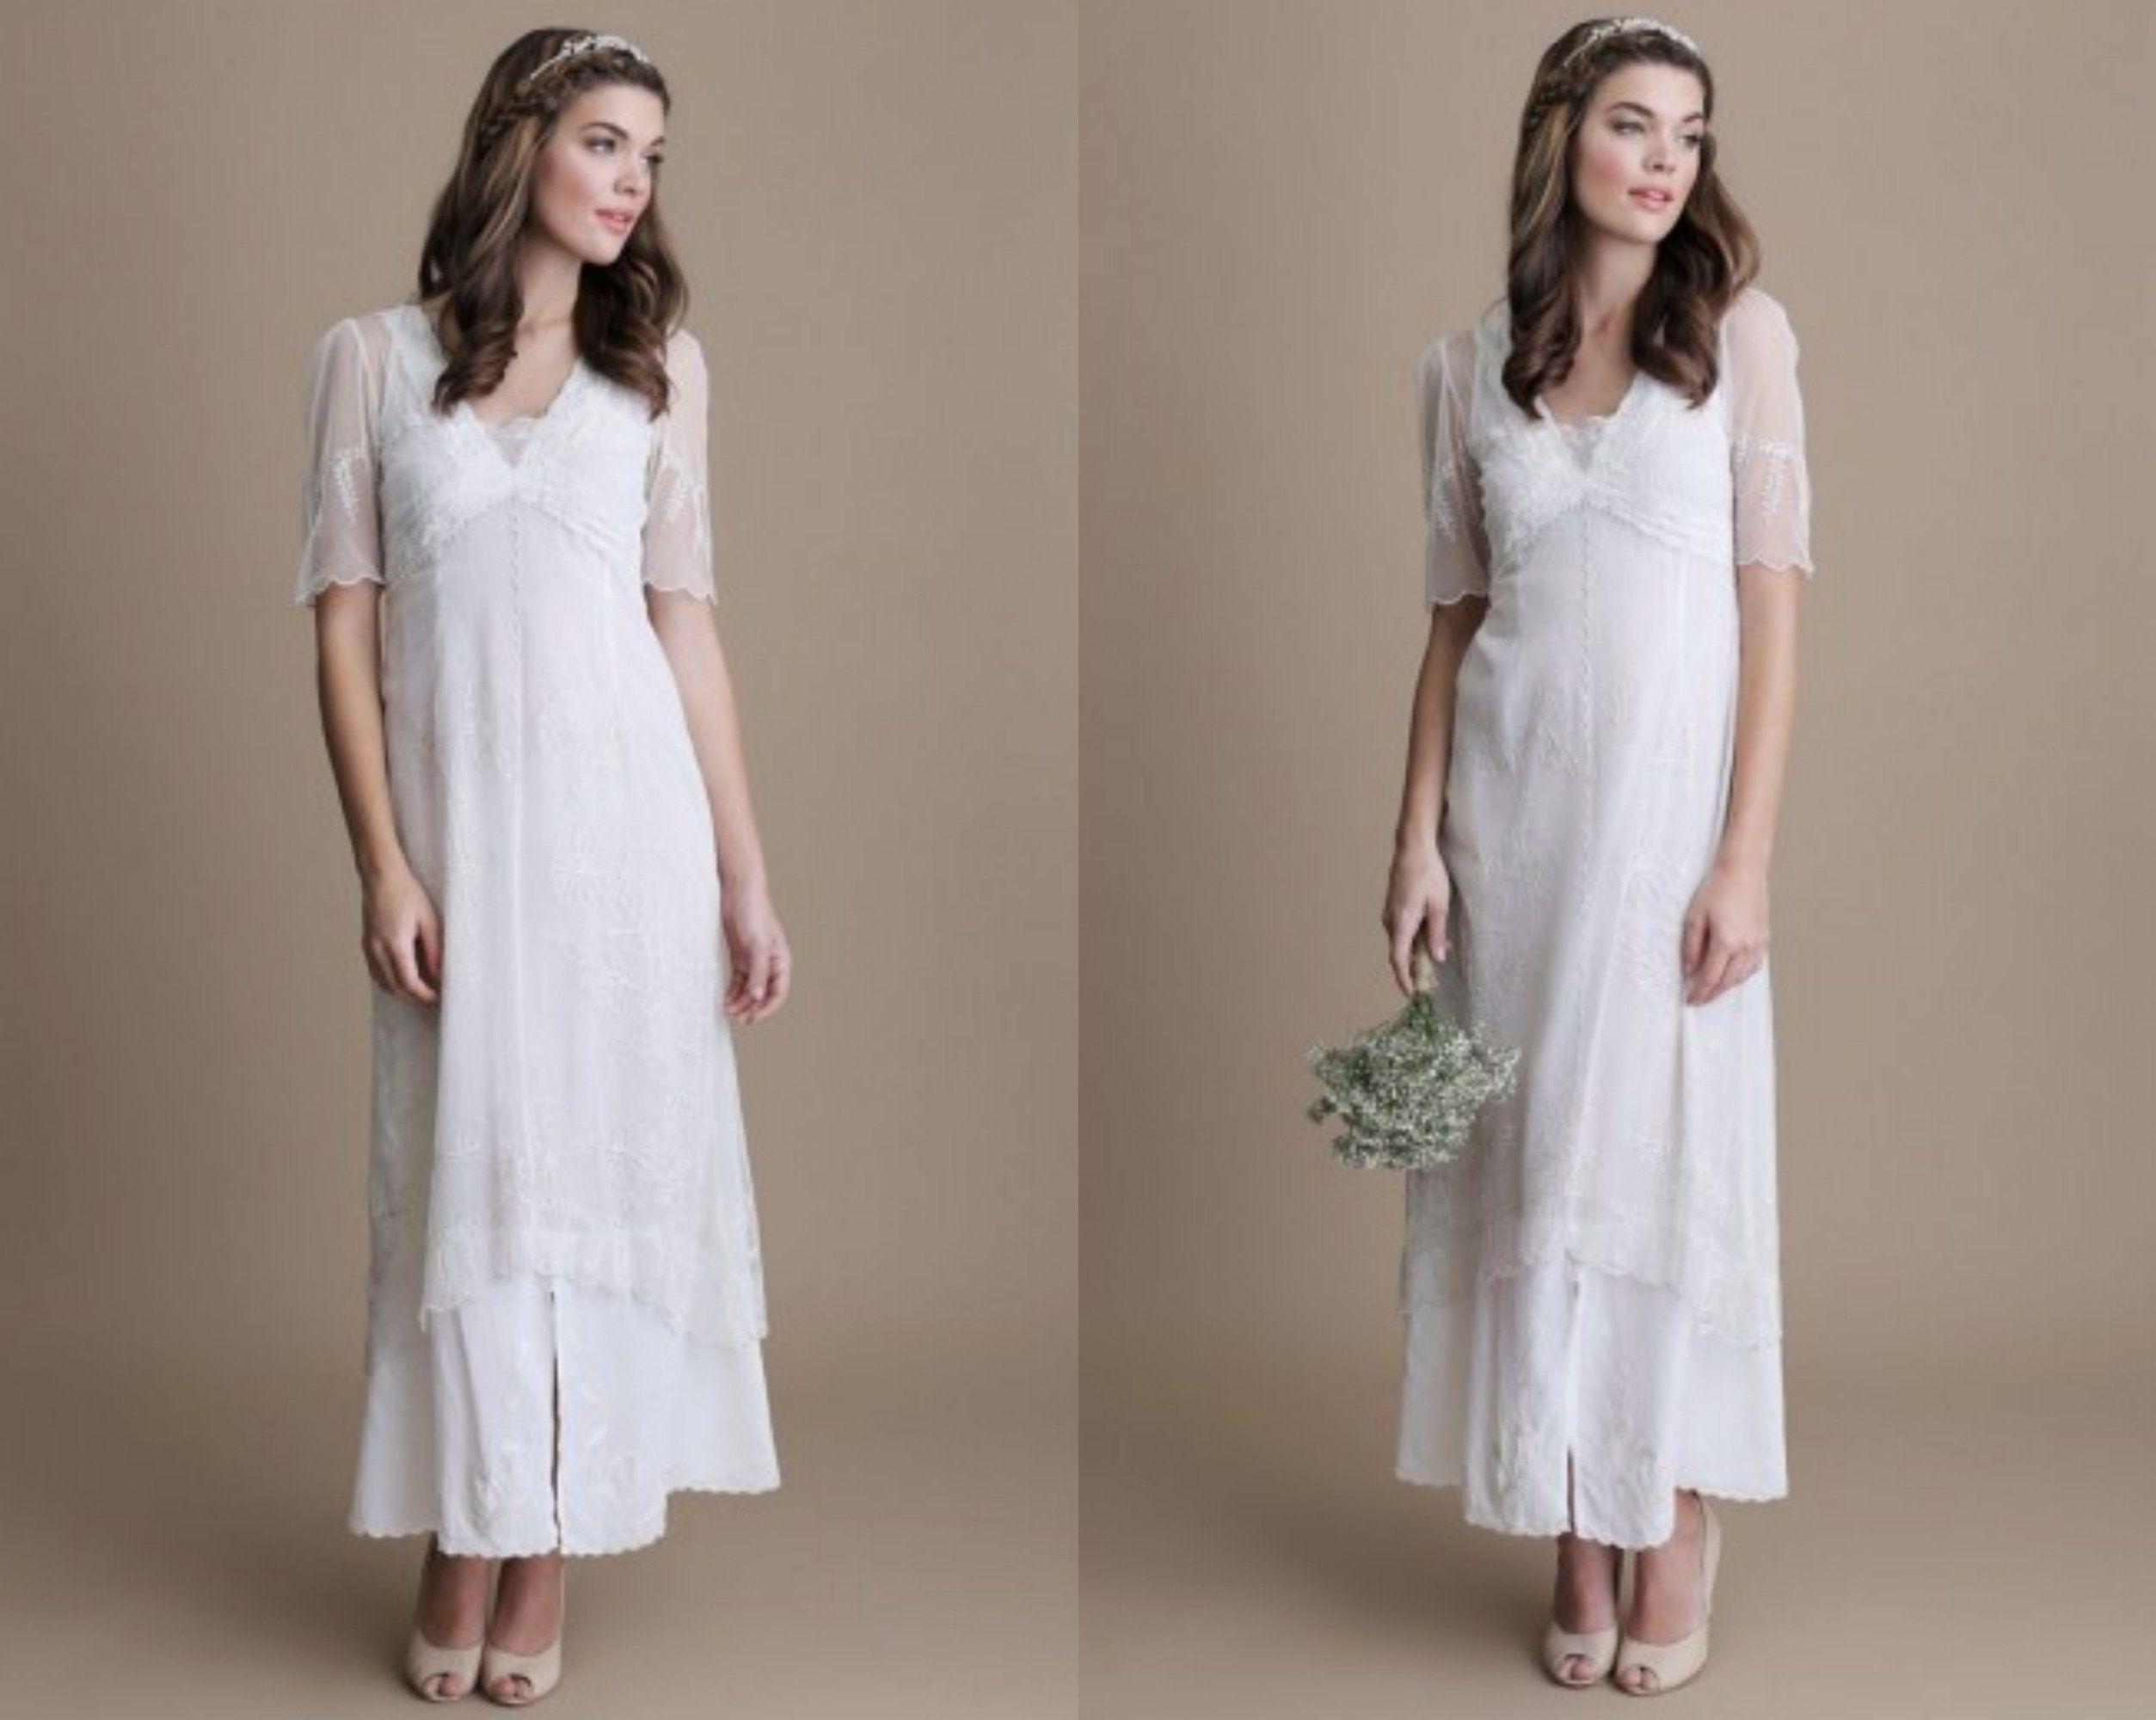 Boho style wedding gowns boho style boho and gowns